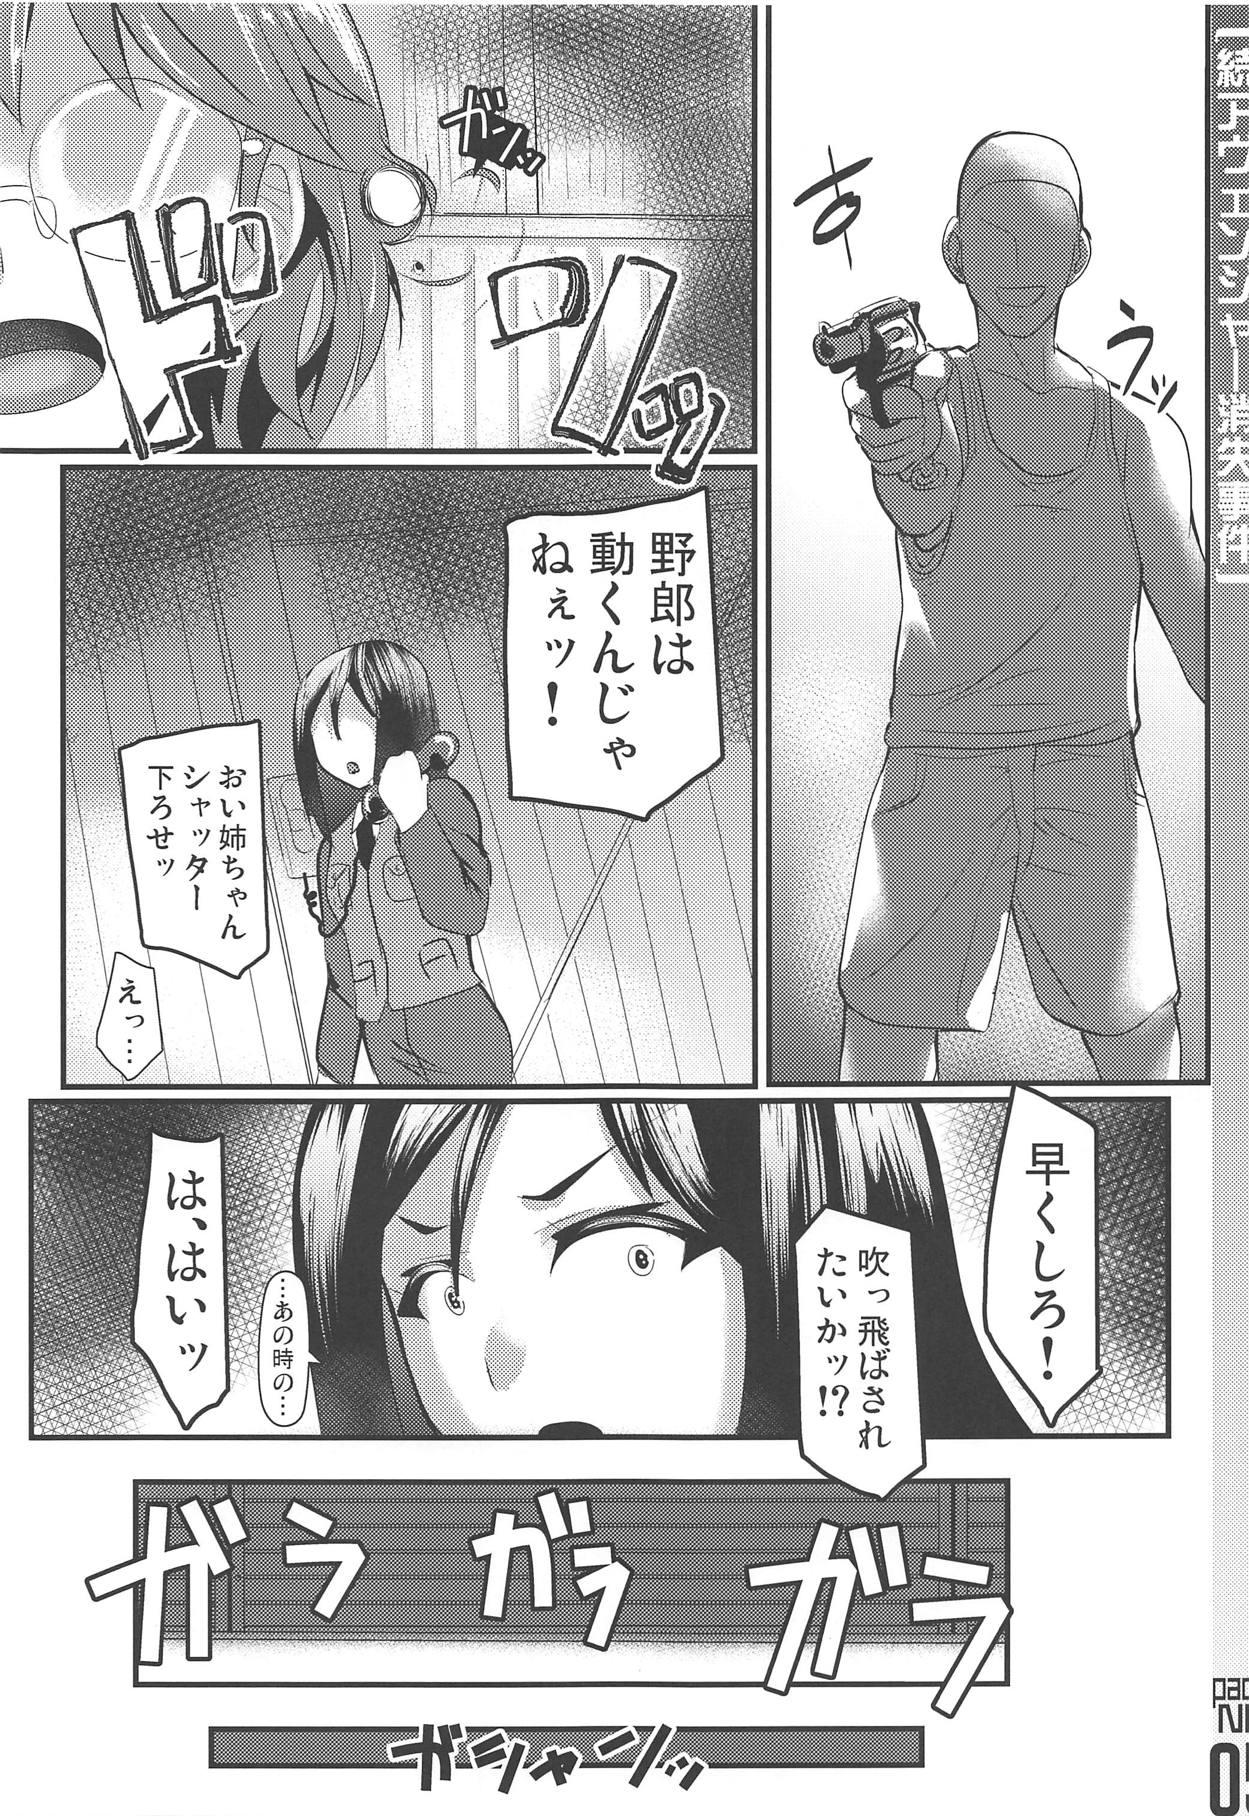 (Panzer Vor! 18) [Trample Rigger (Yequo)] Zoku [Me-gata] Avenger Shoushitsu Jiken (Girls und Panzer) 3